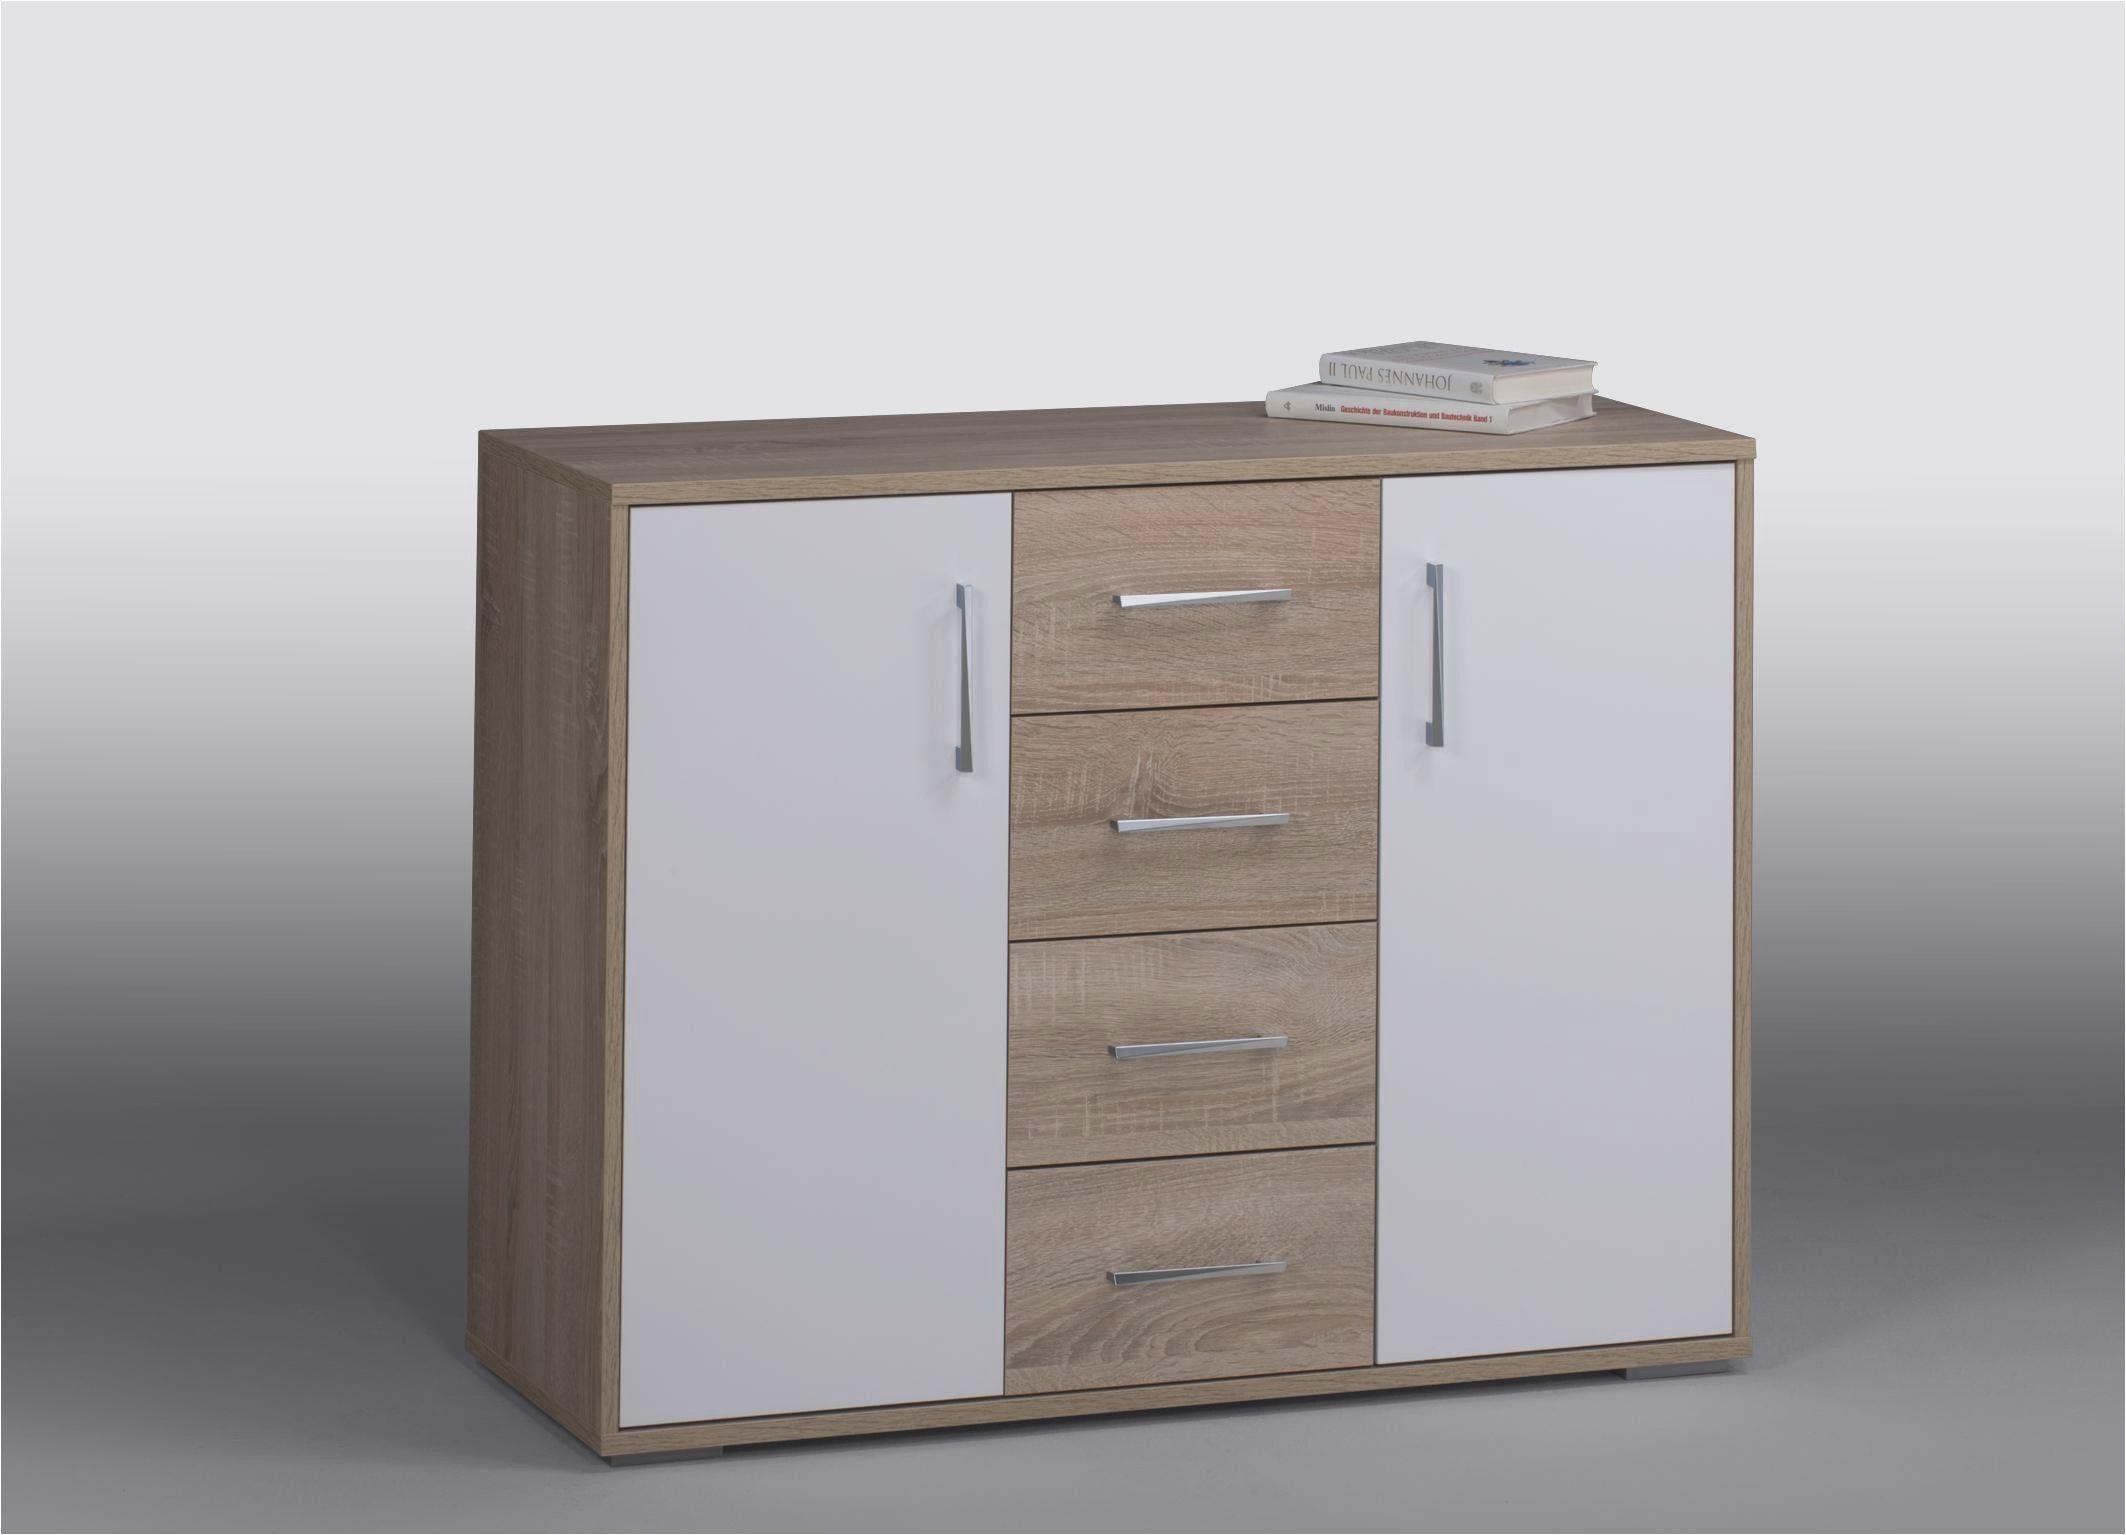 Conforama Armoire 2 Portes Conforama Armoire 2 Portes Lingere 2 Portes 1 Tiroir Cobi Coloris Acacia Conforama Lin Locker Storage Bureau Design Cool Furniture